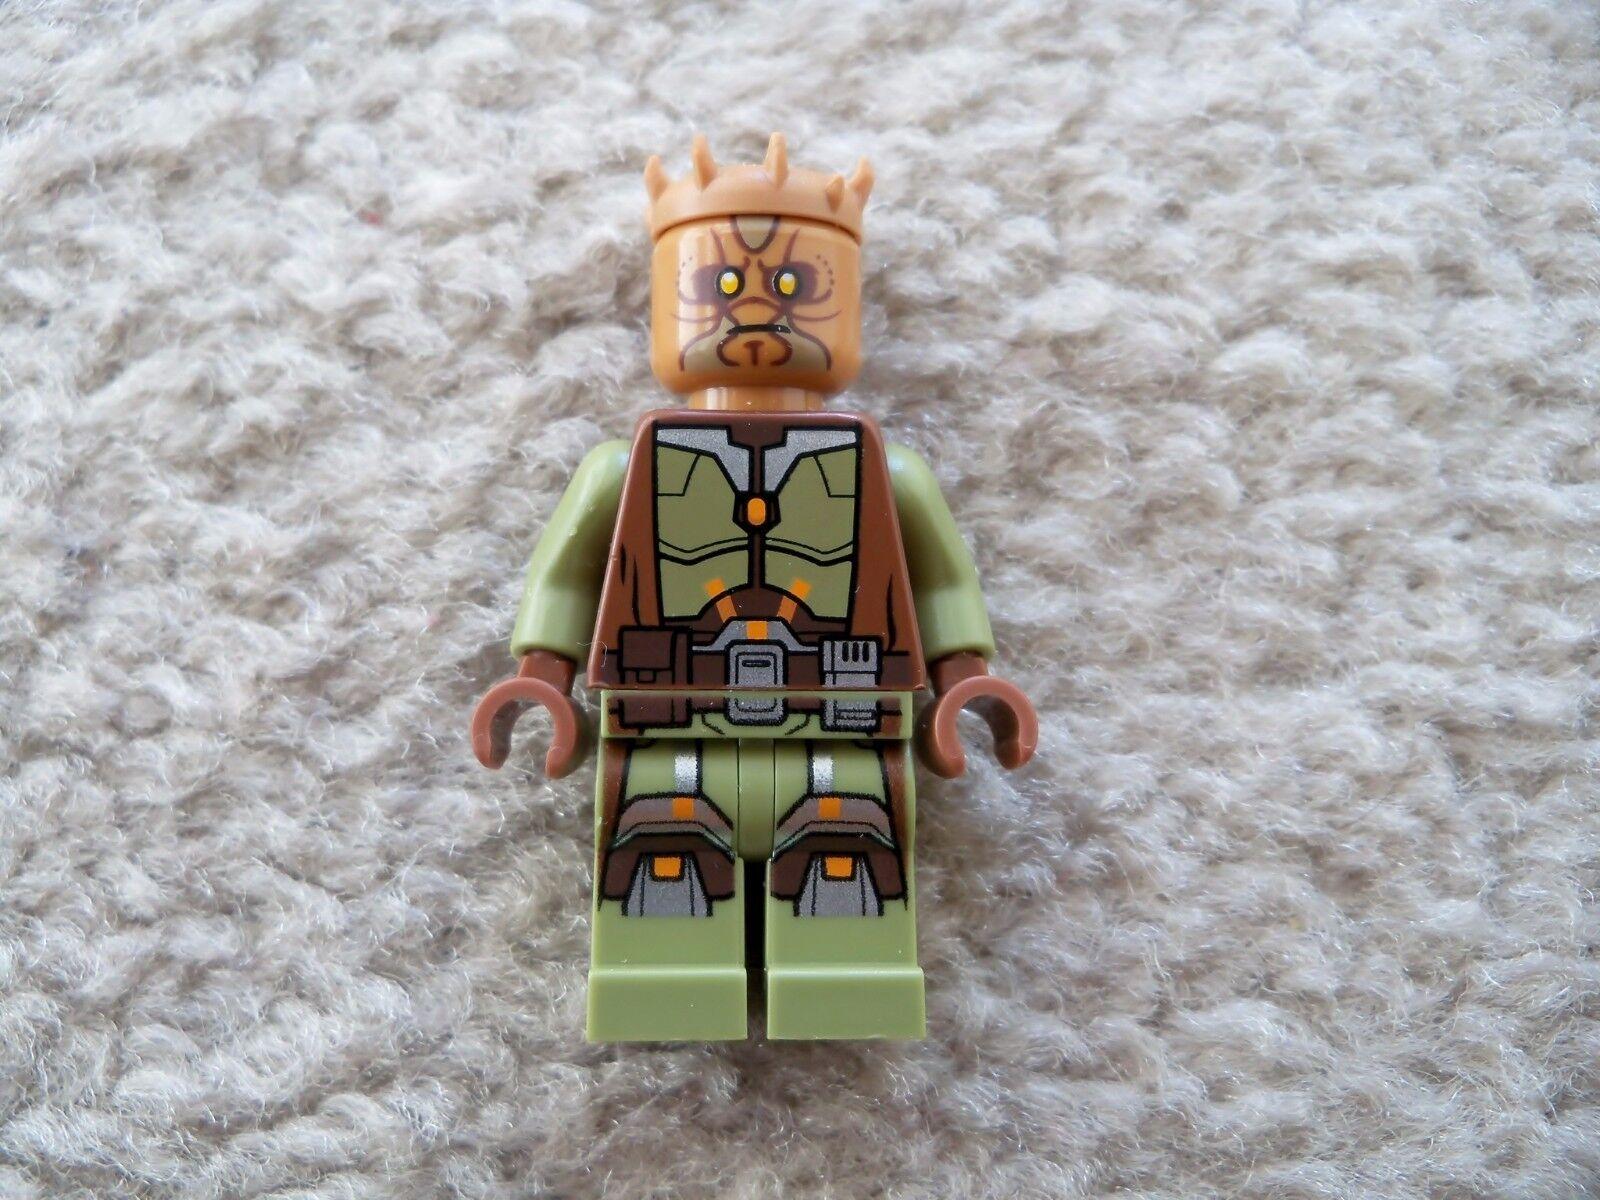 LEGO Star Wars Old Republic - Super Rare - Jedi Knight - From 75025 - Excellent